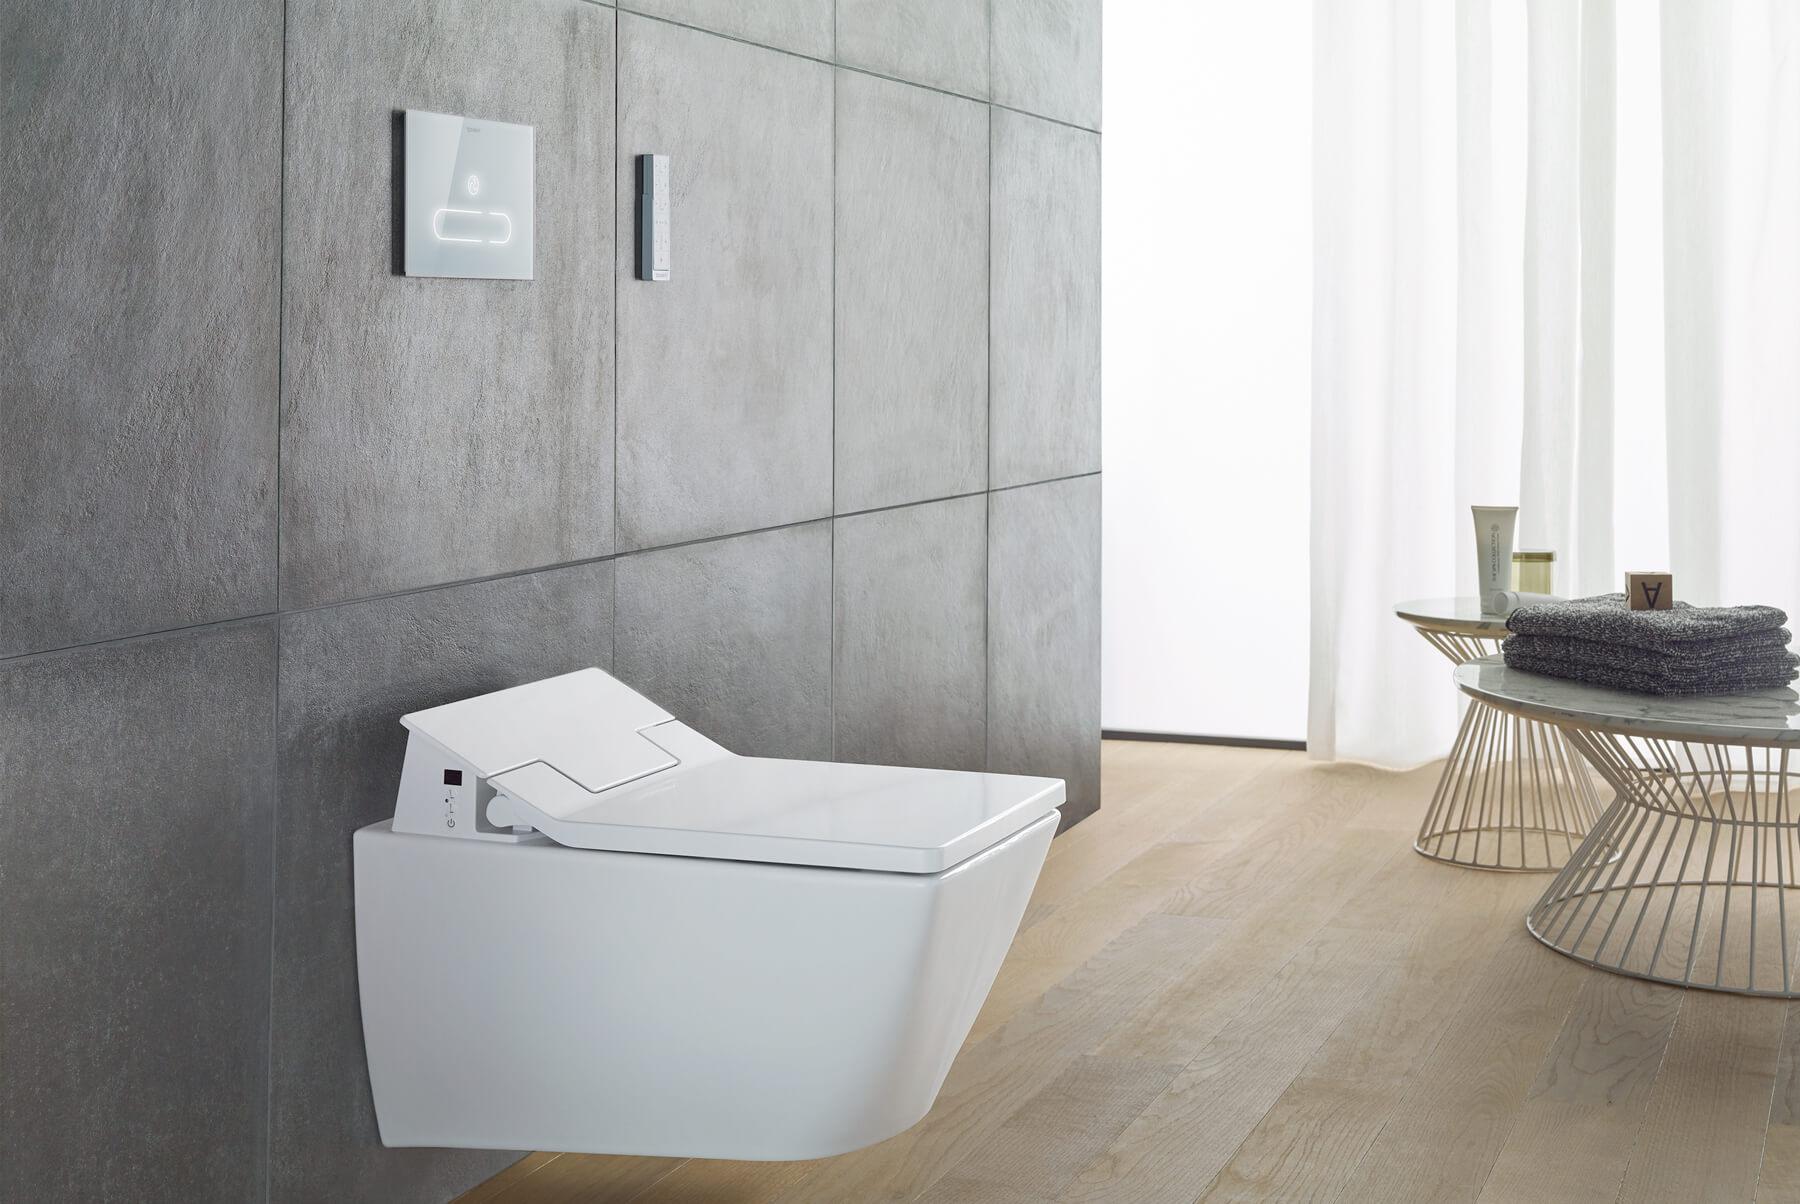 WC-&-WASHLETS-Duravit-SensoWash-INSET-3-1800x1204